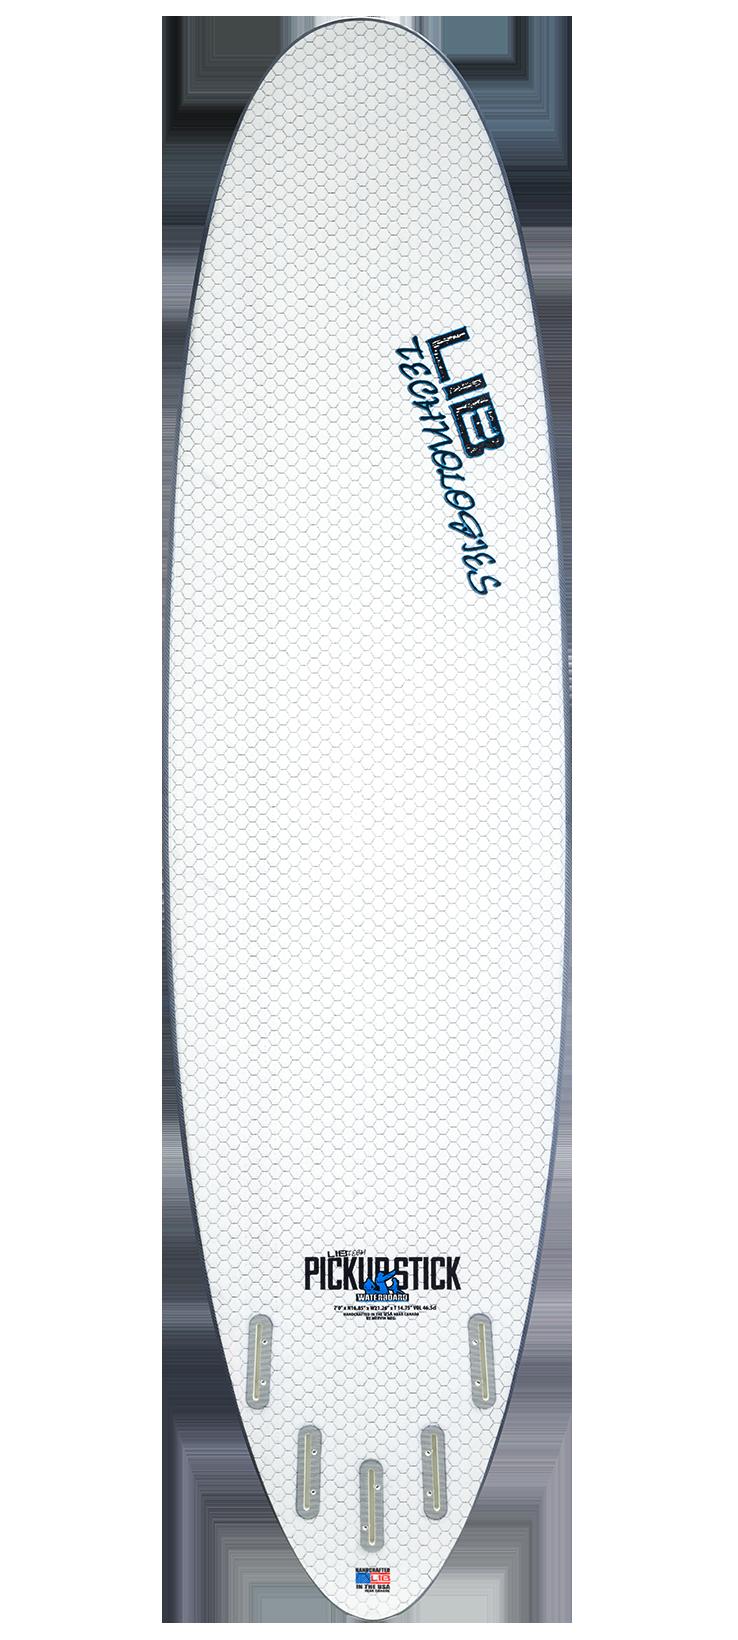 lib tech surfboards - surfers mag